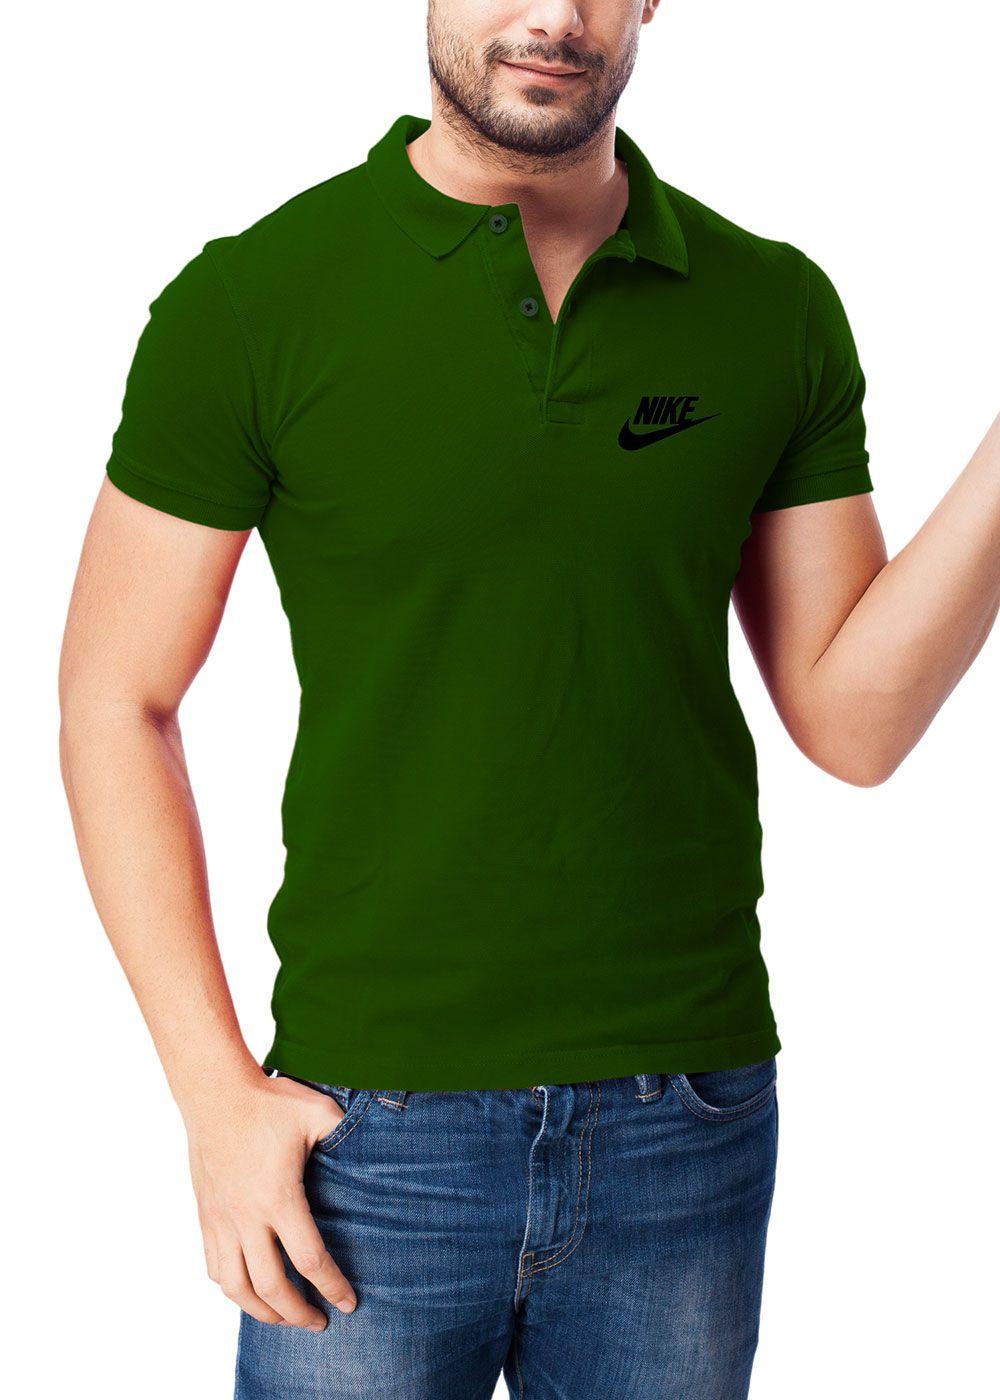 Male Model Polo Shirt Mockup In Psd Male Model Polo Shirt